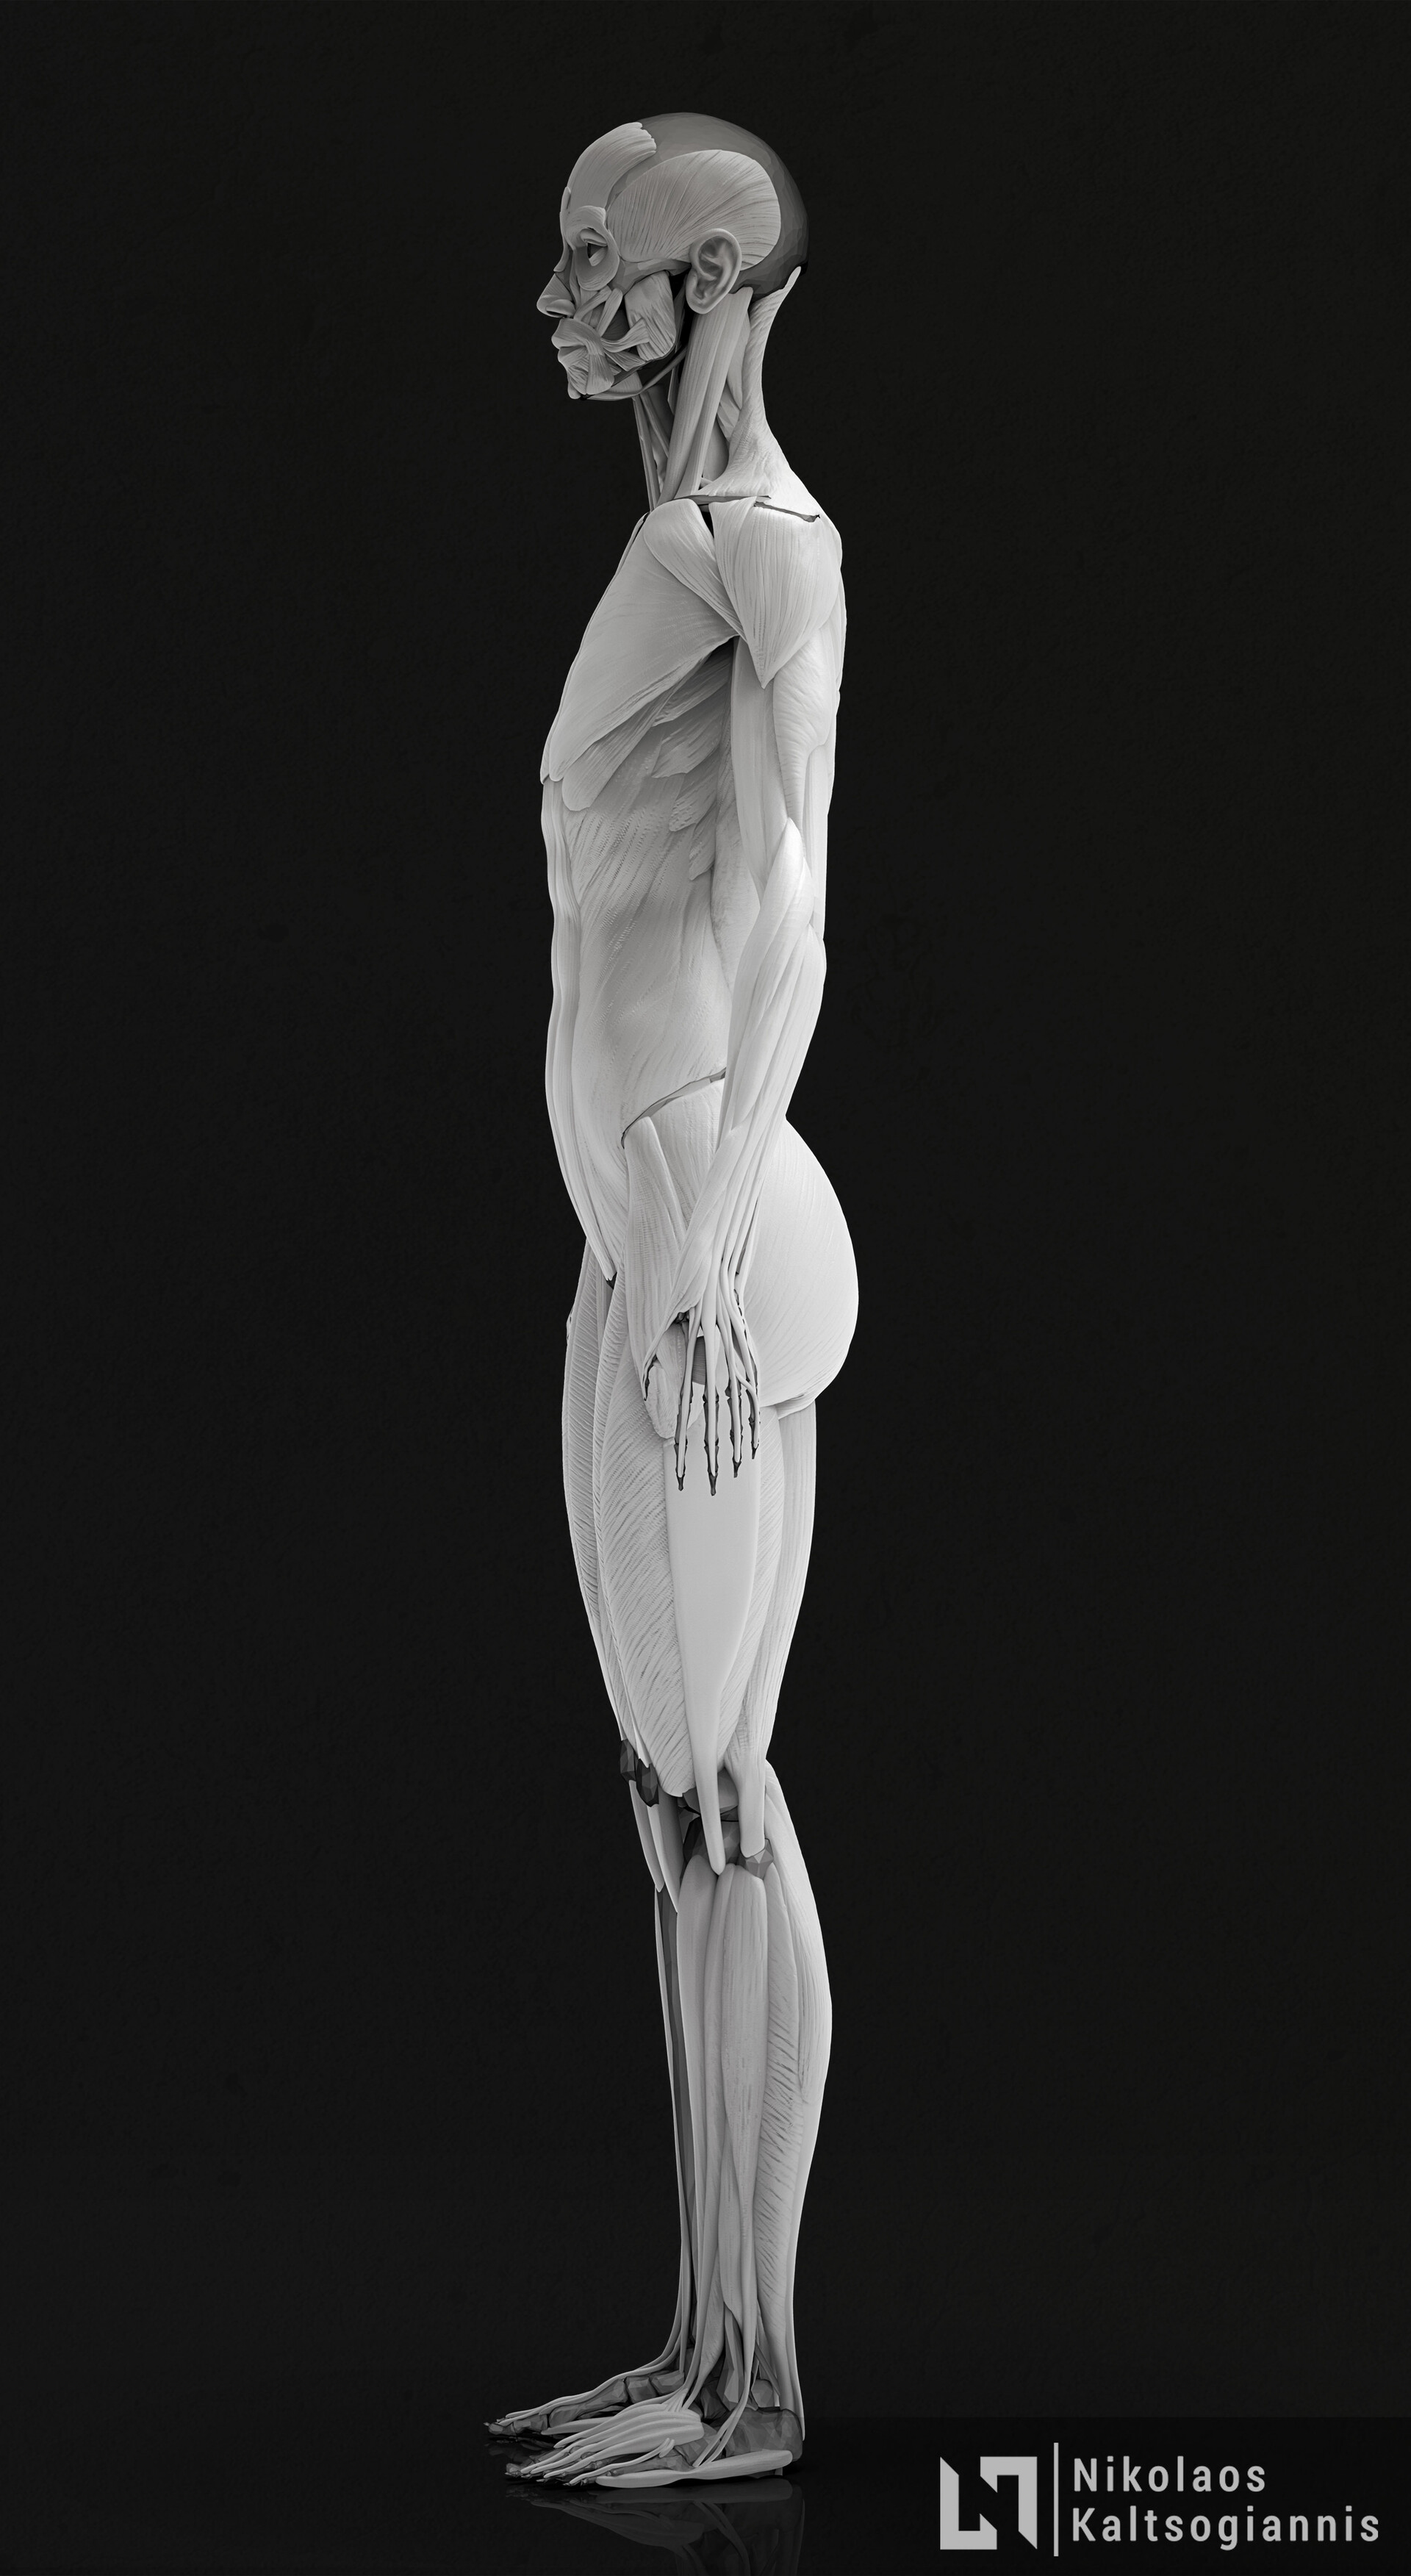 Nikolaos kaltsogiannis female anatomy echorche 03